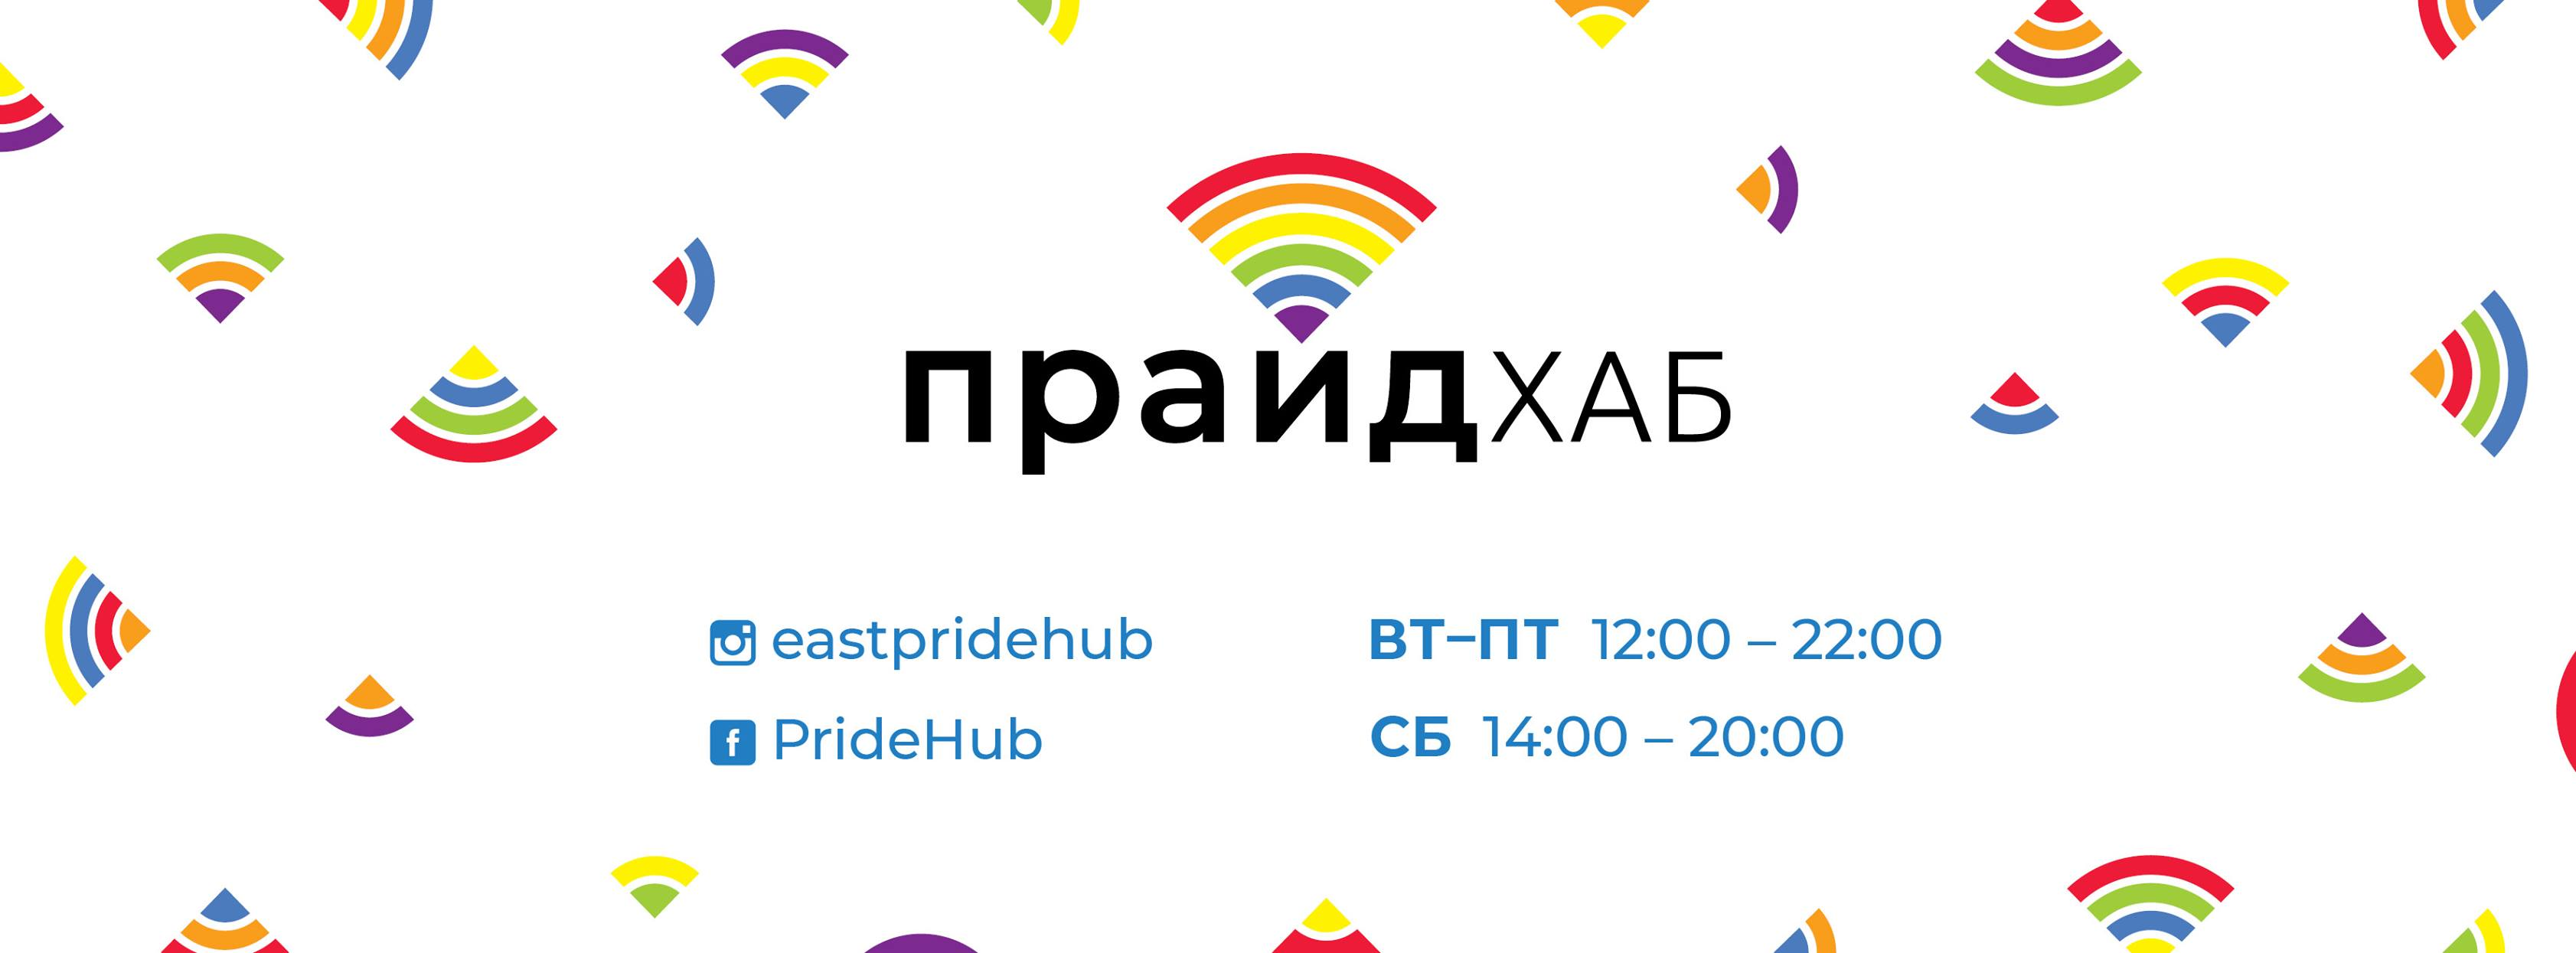 Транс*пространство в PrideHub